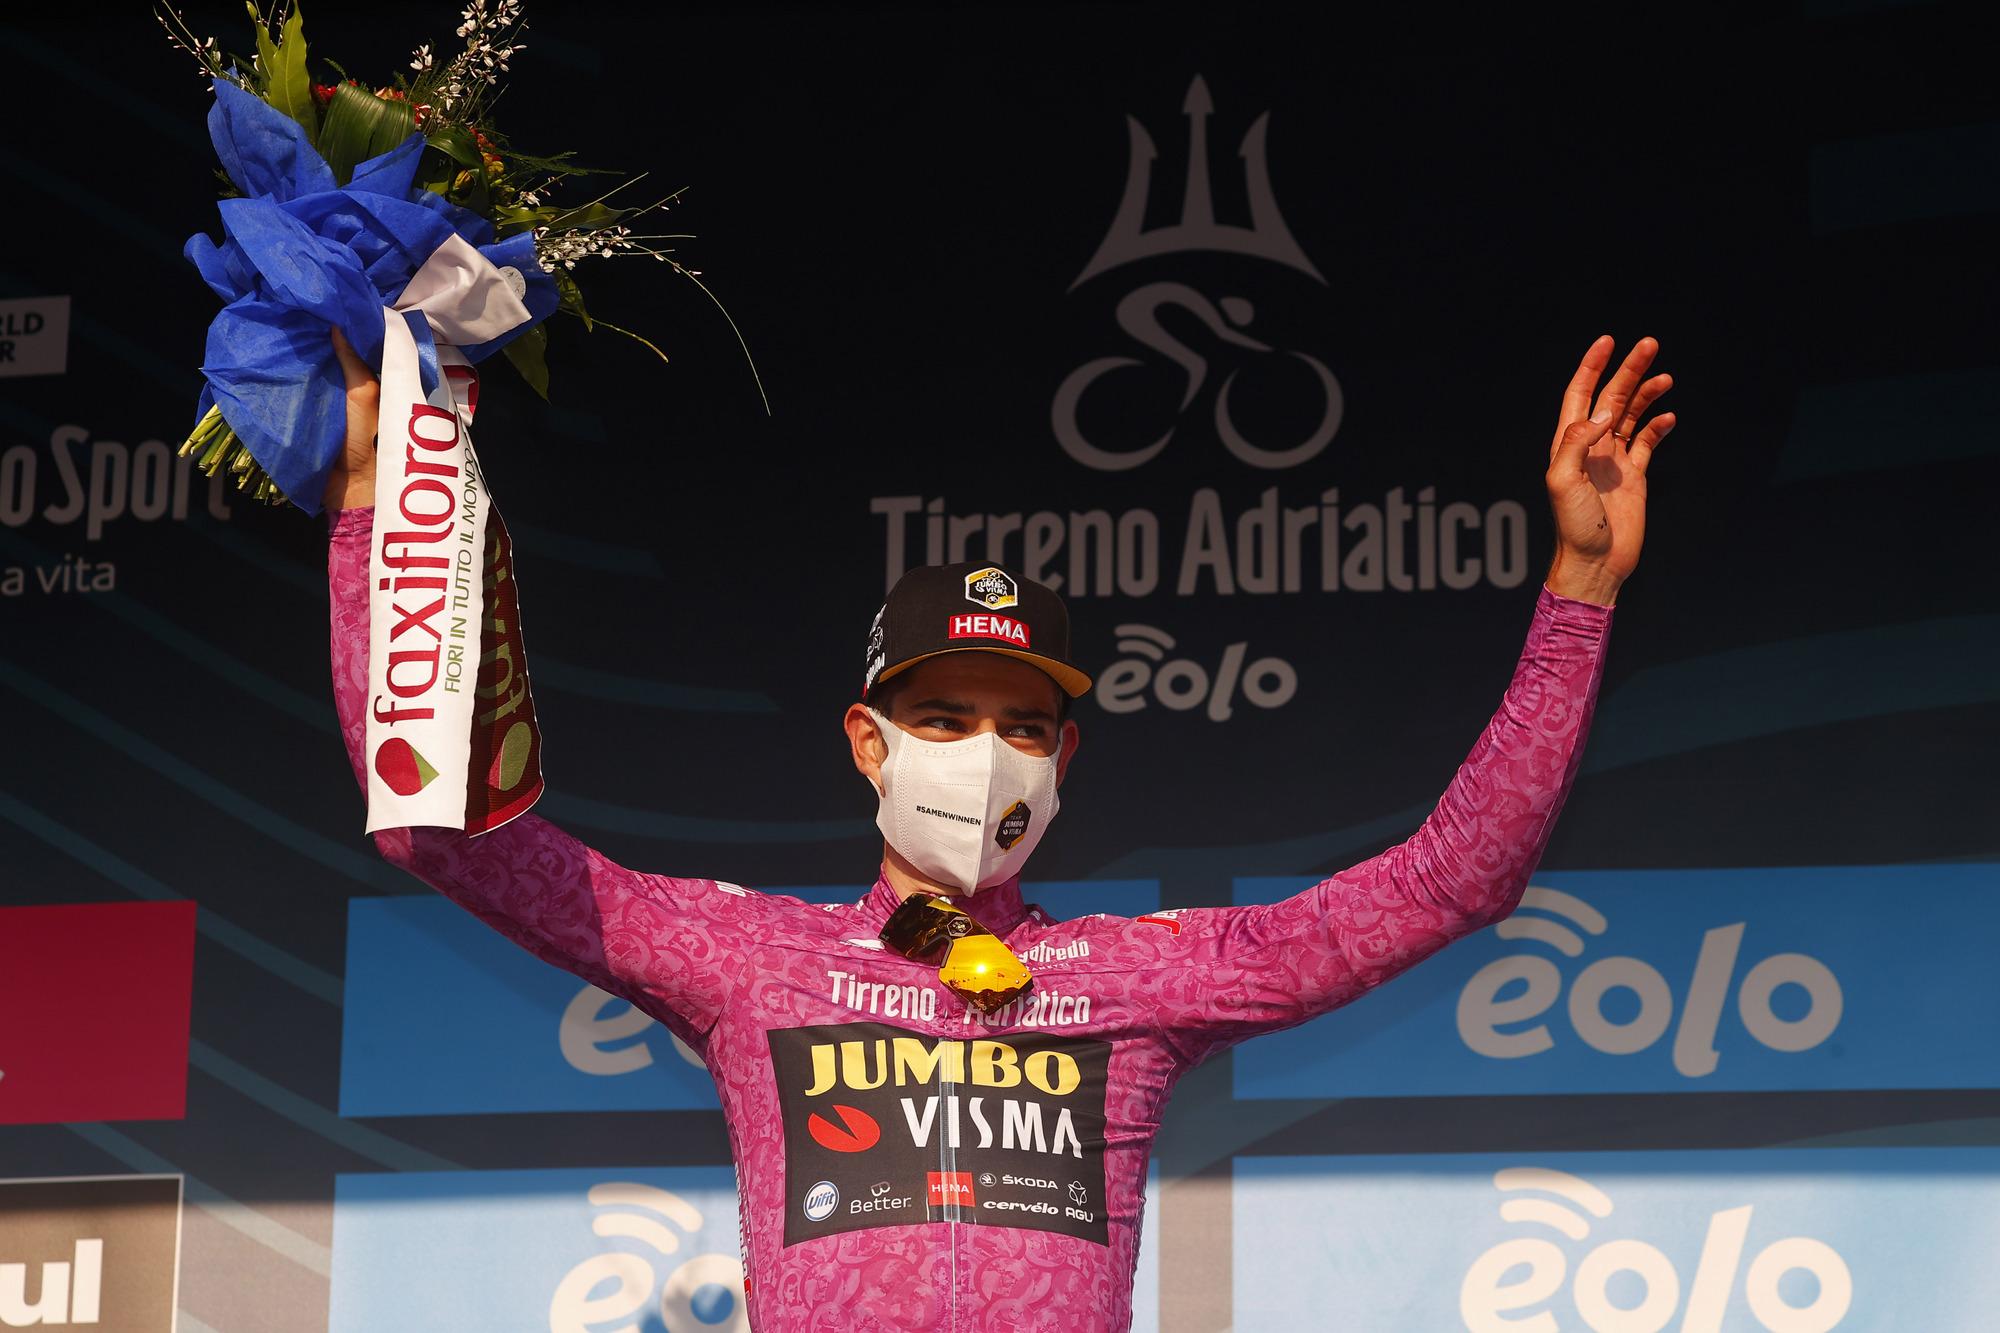 Tirreno Adriatico 2021 56th Edition 1st stage Lido di Camaiore Lido di Camaiore 156 km 10032021 Wout Van Aert BEL Jumbo Visma photo Luca BettiniBettiniPhoto2021